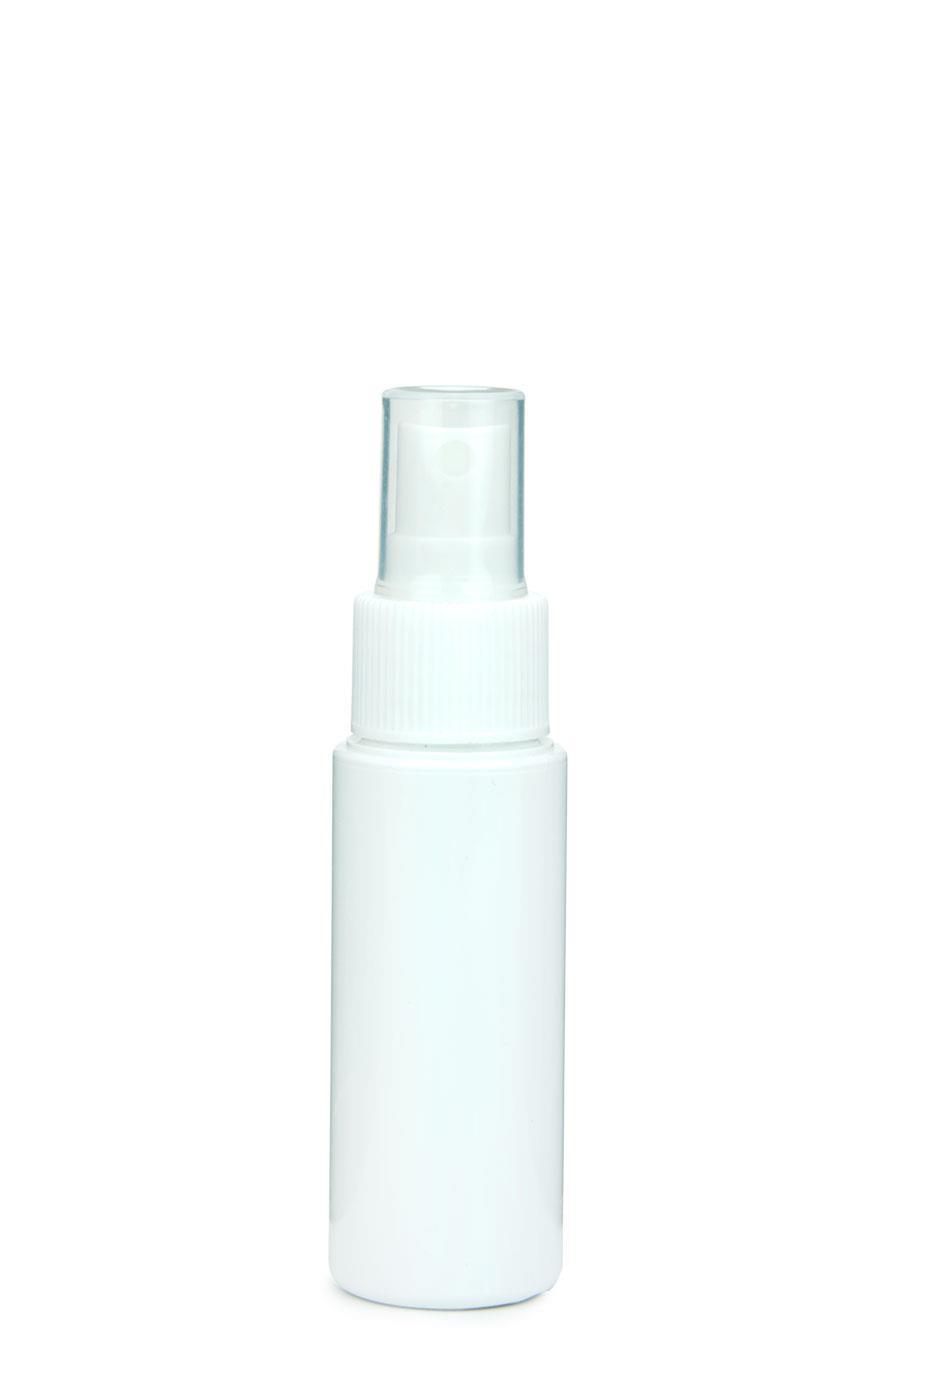 pet flasche leonora 50 ml weiss inkl spray zerst uber pumpe basic 24 410 weiss. Black Bedroom Furniture Sets. Home Design Ideas